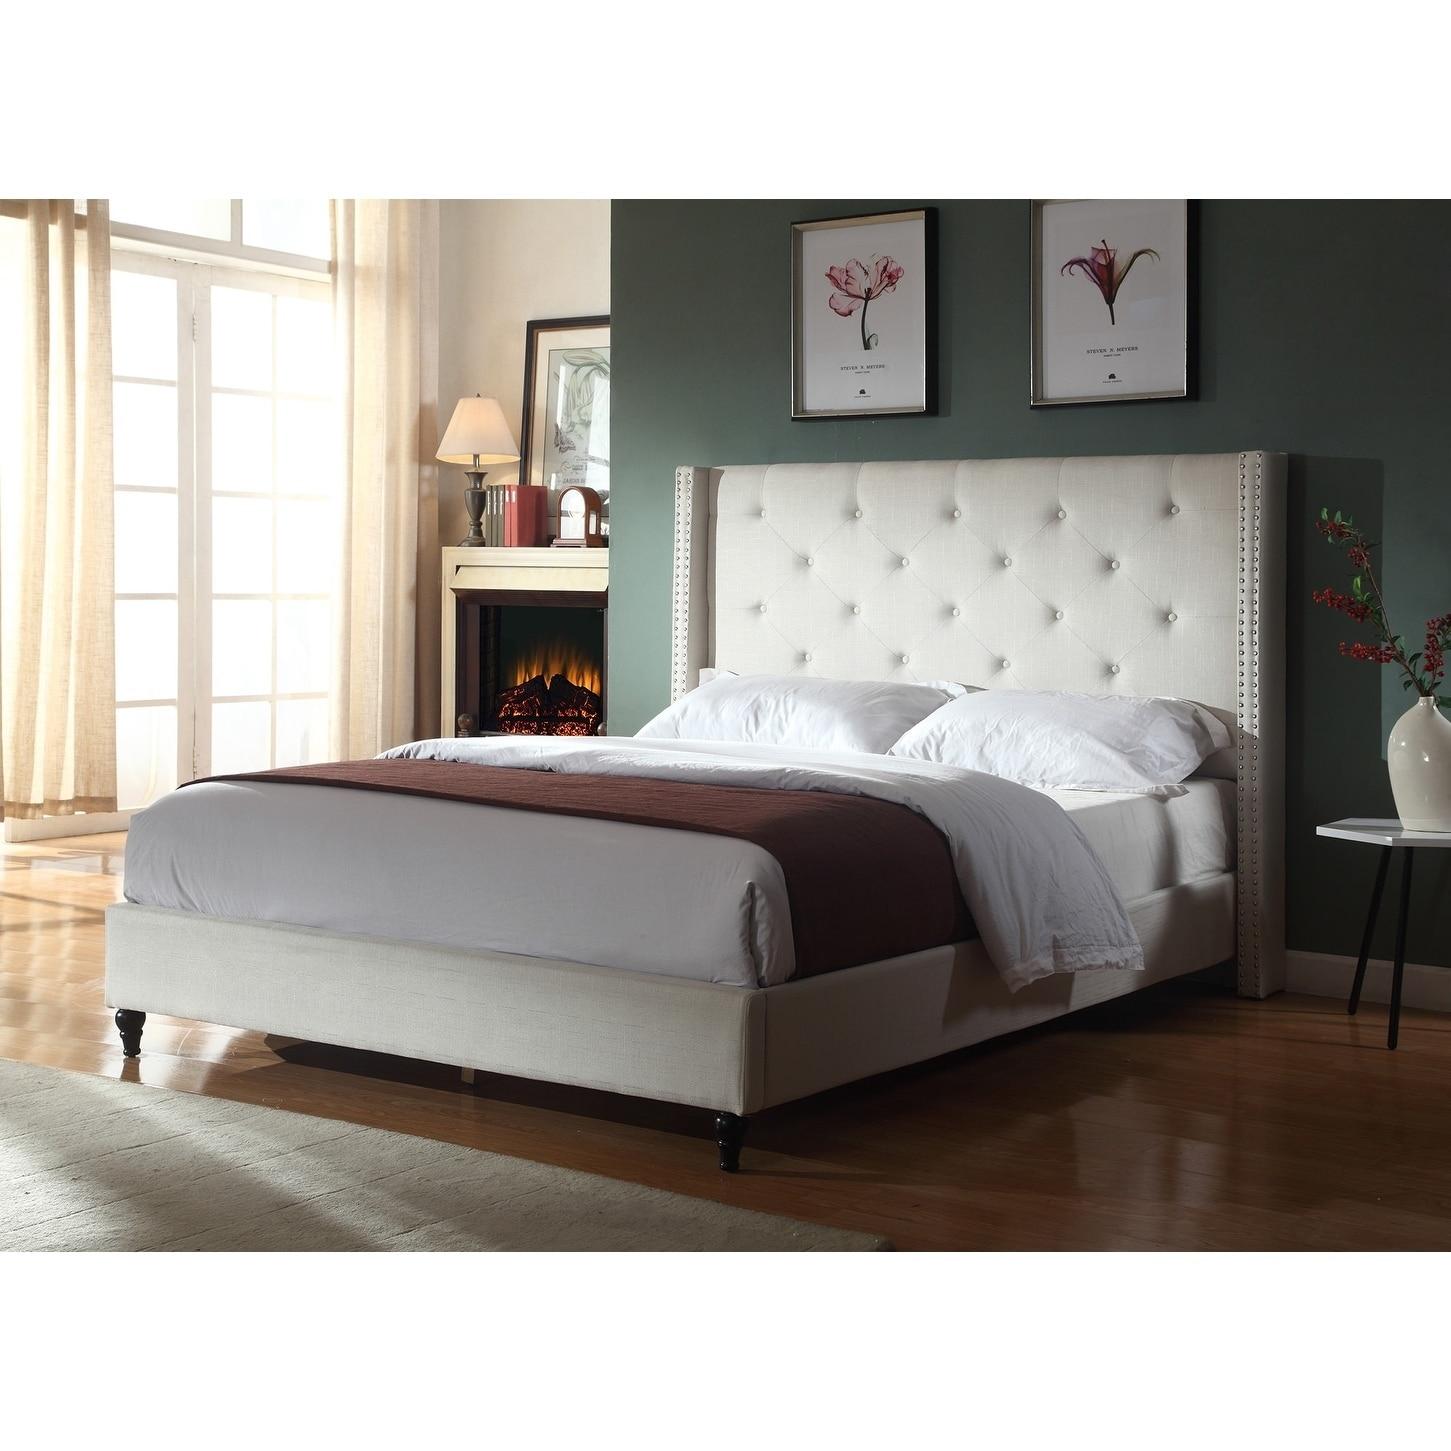 Best Master Furniture Upholstered Wingback Panel Bed